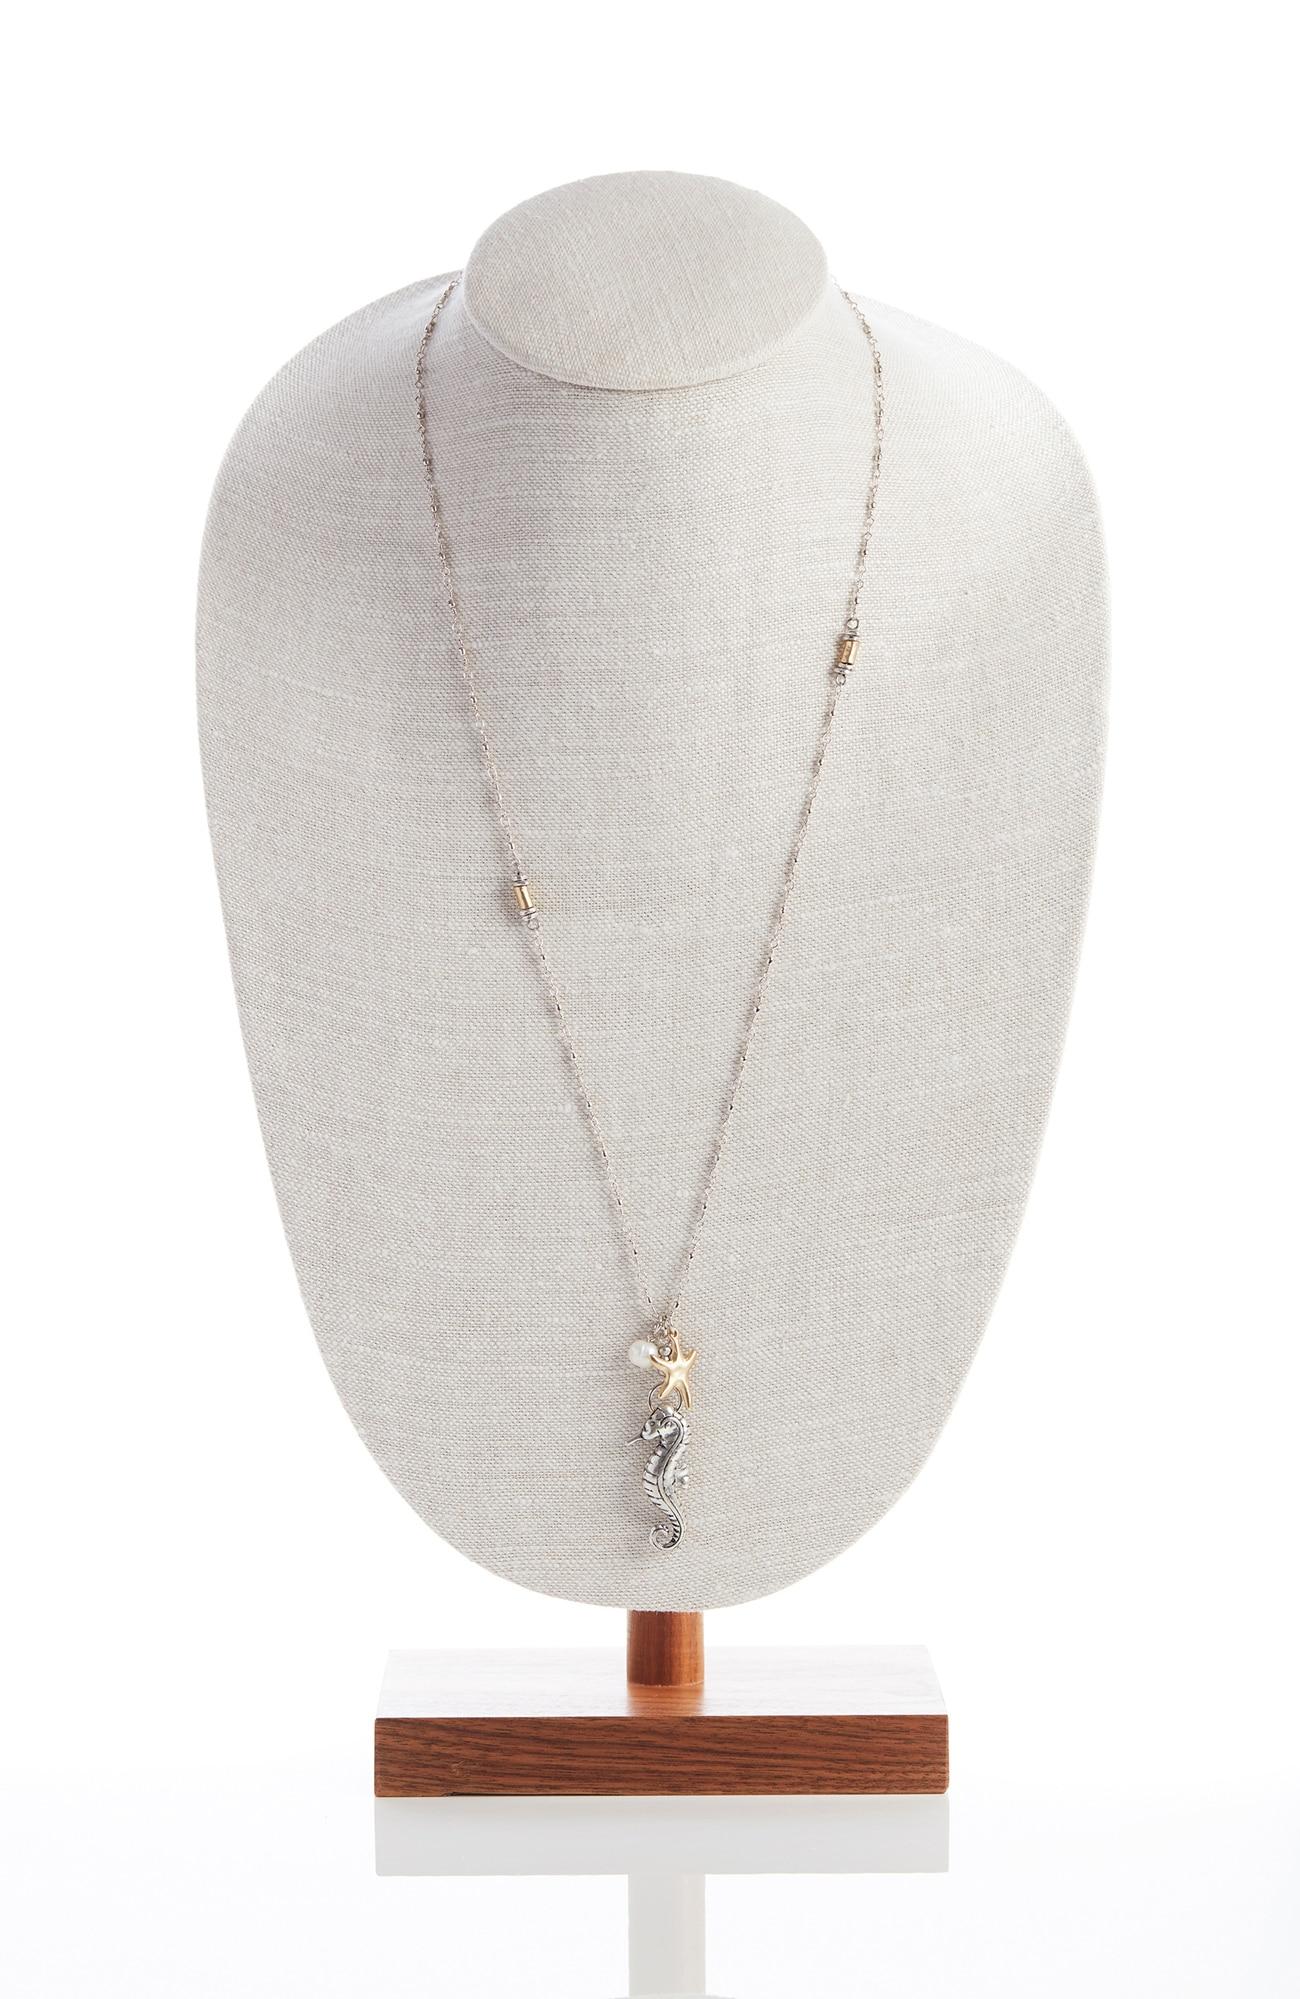 sand & sea charm necklace